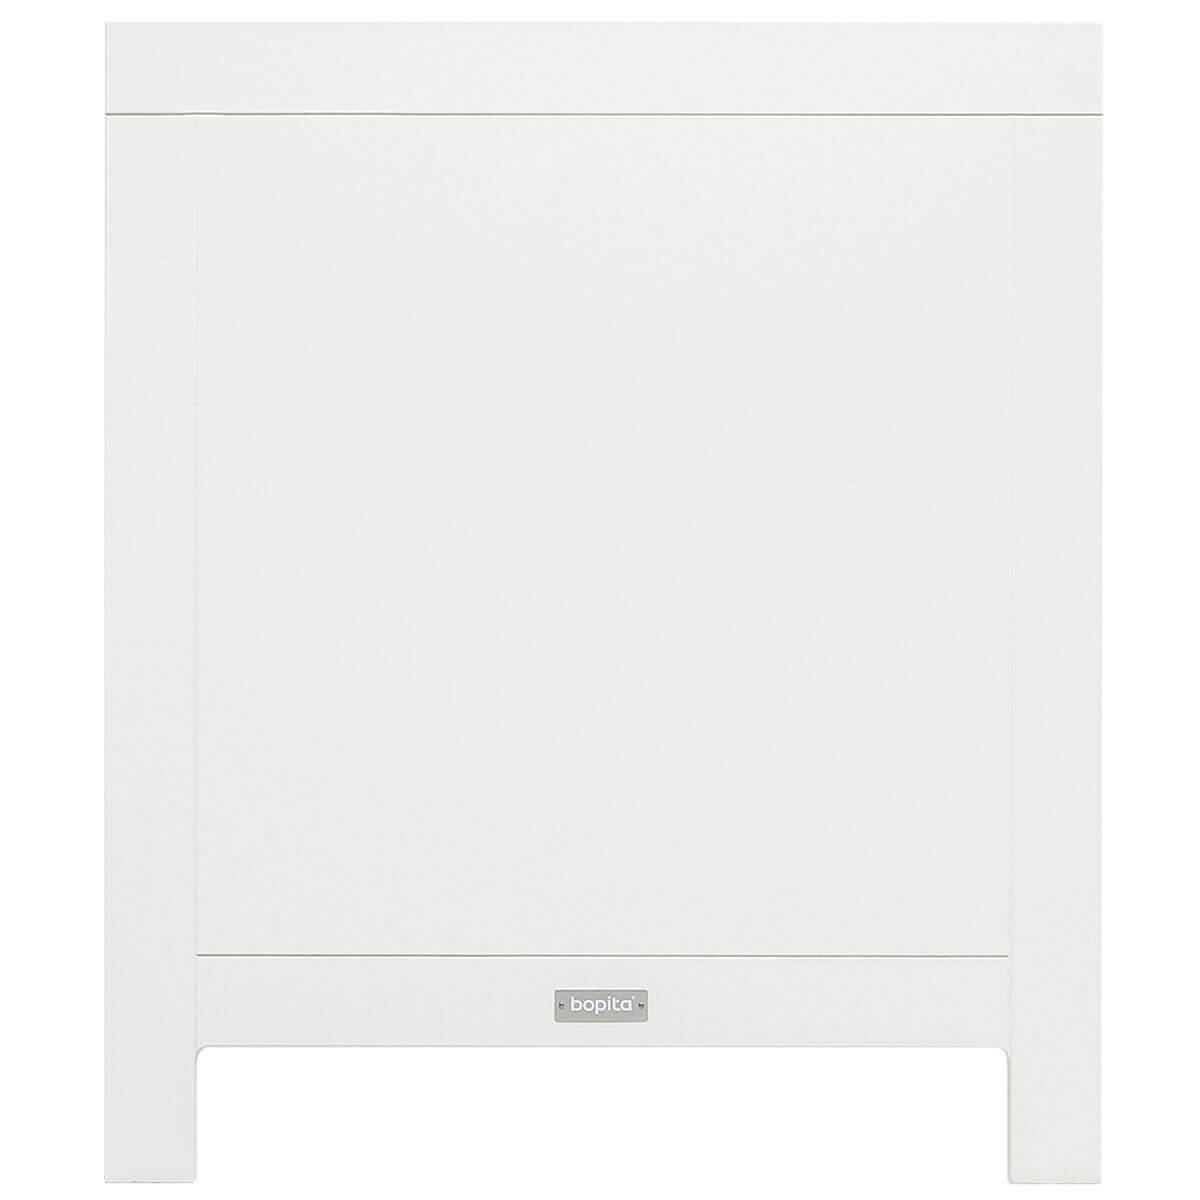 Cuna 60x120cm THIJN Bopita blanco